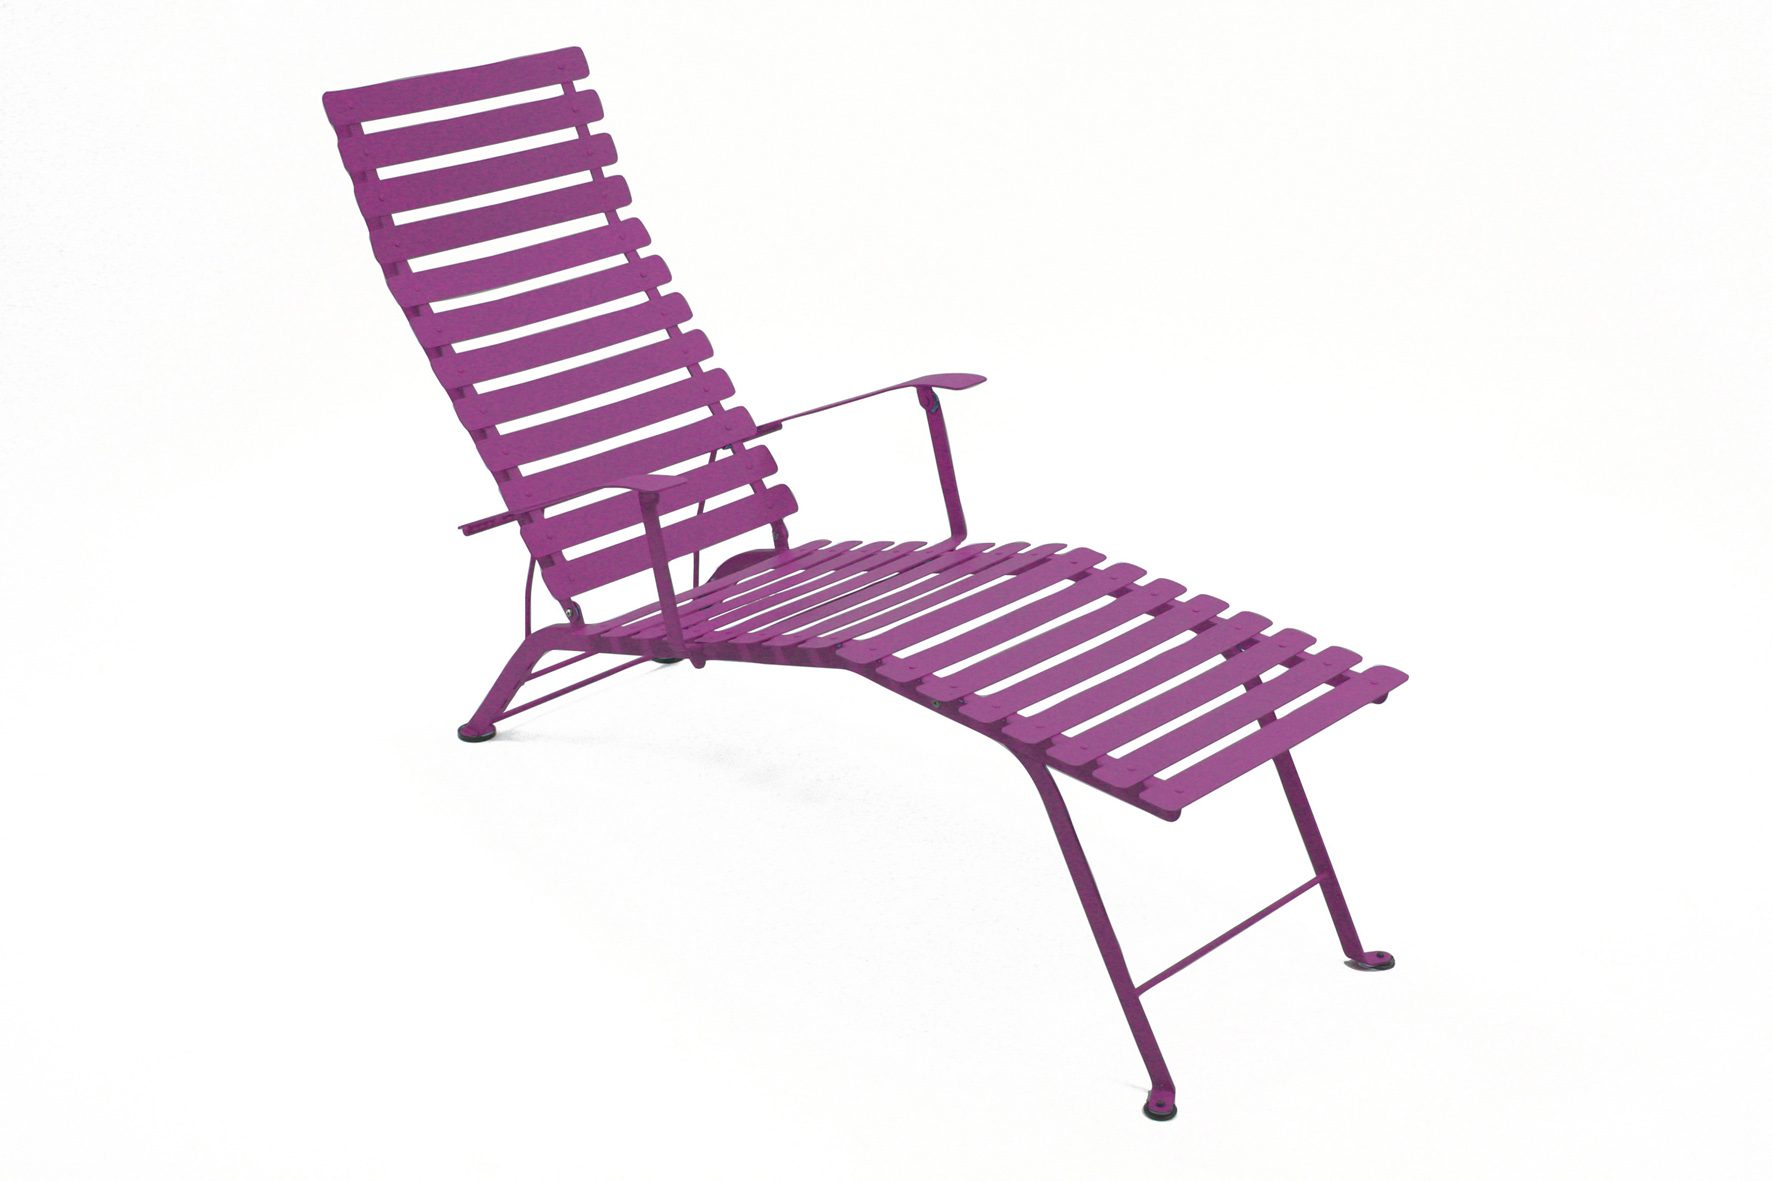 Bistro chaise longue-160128